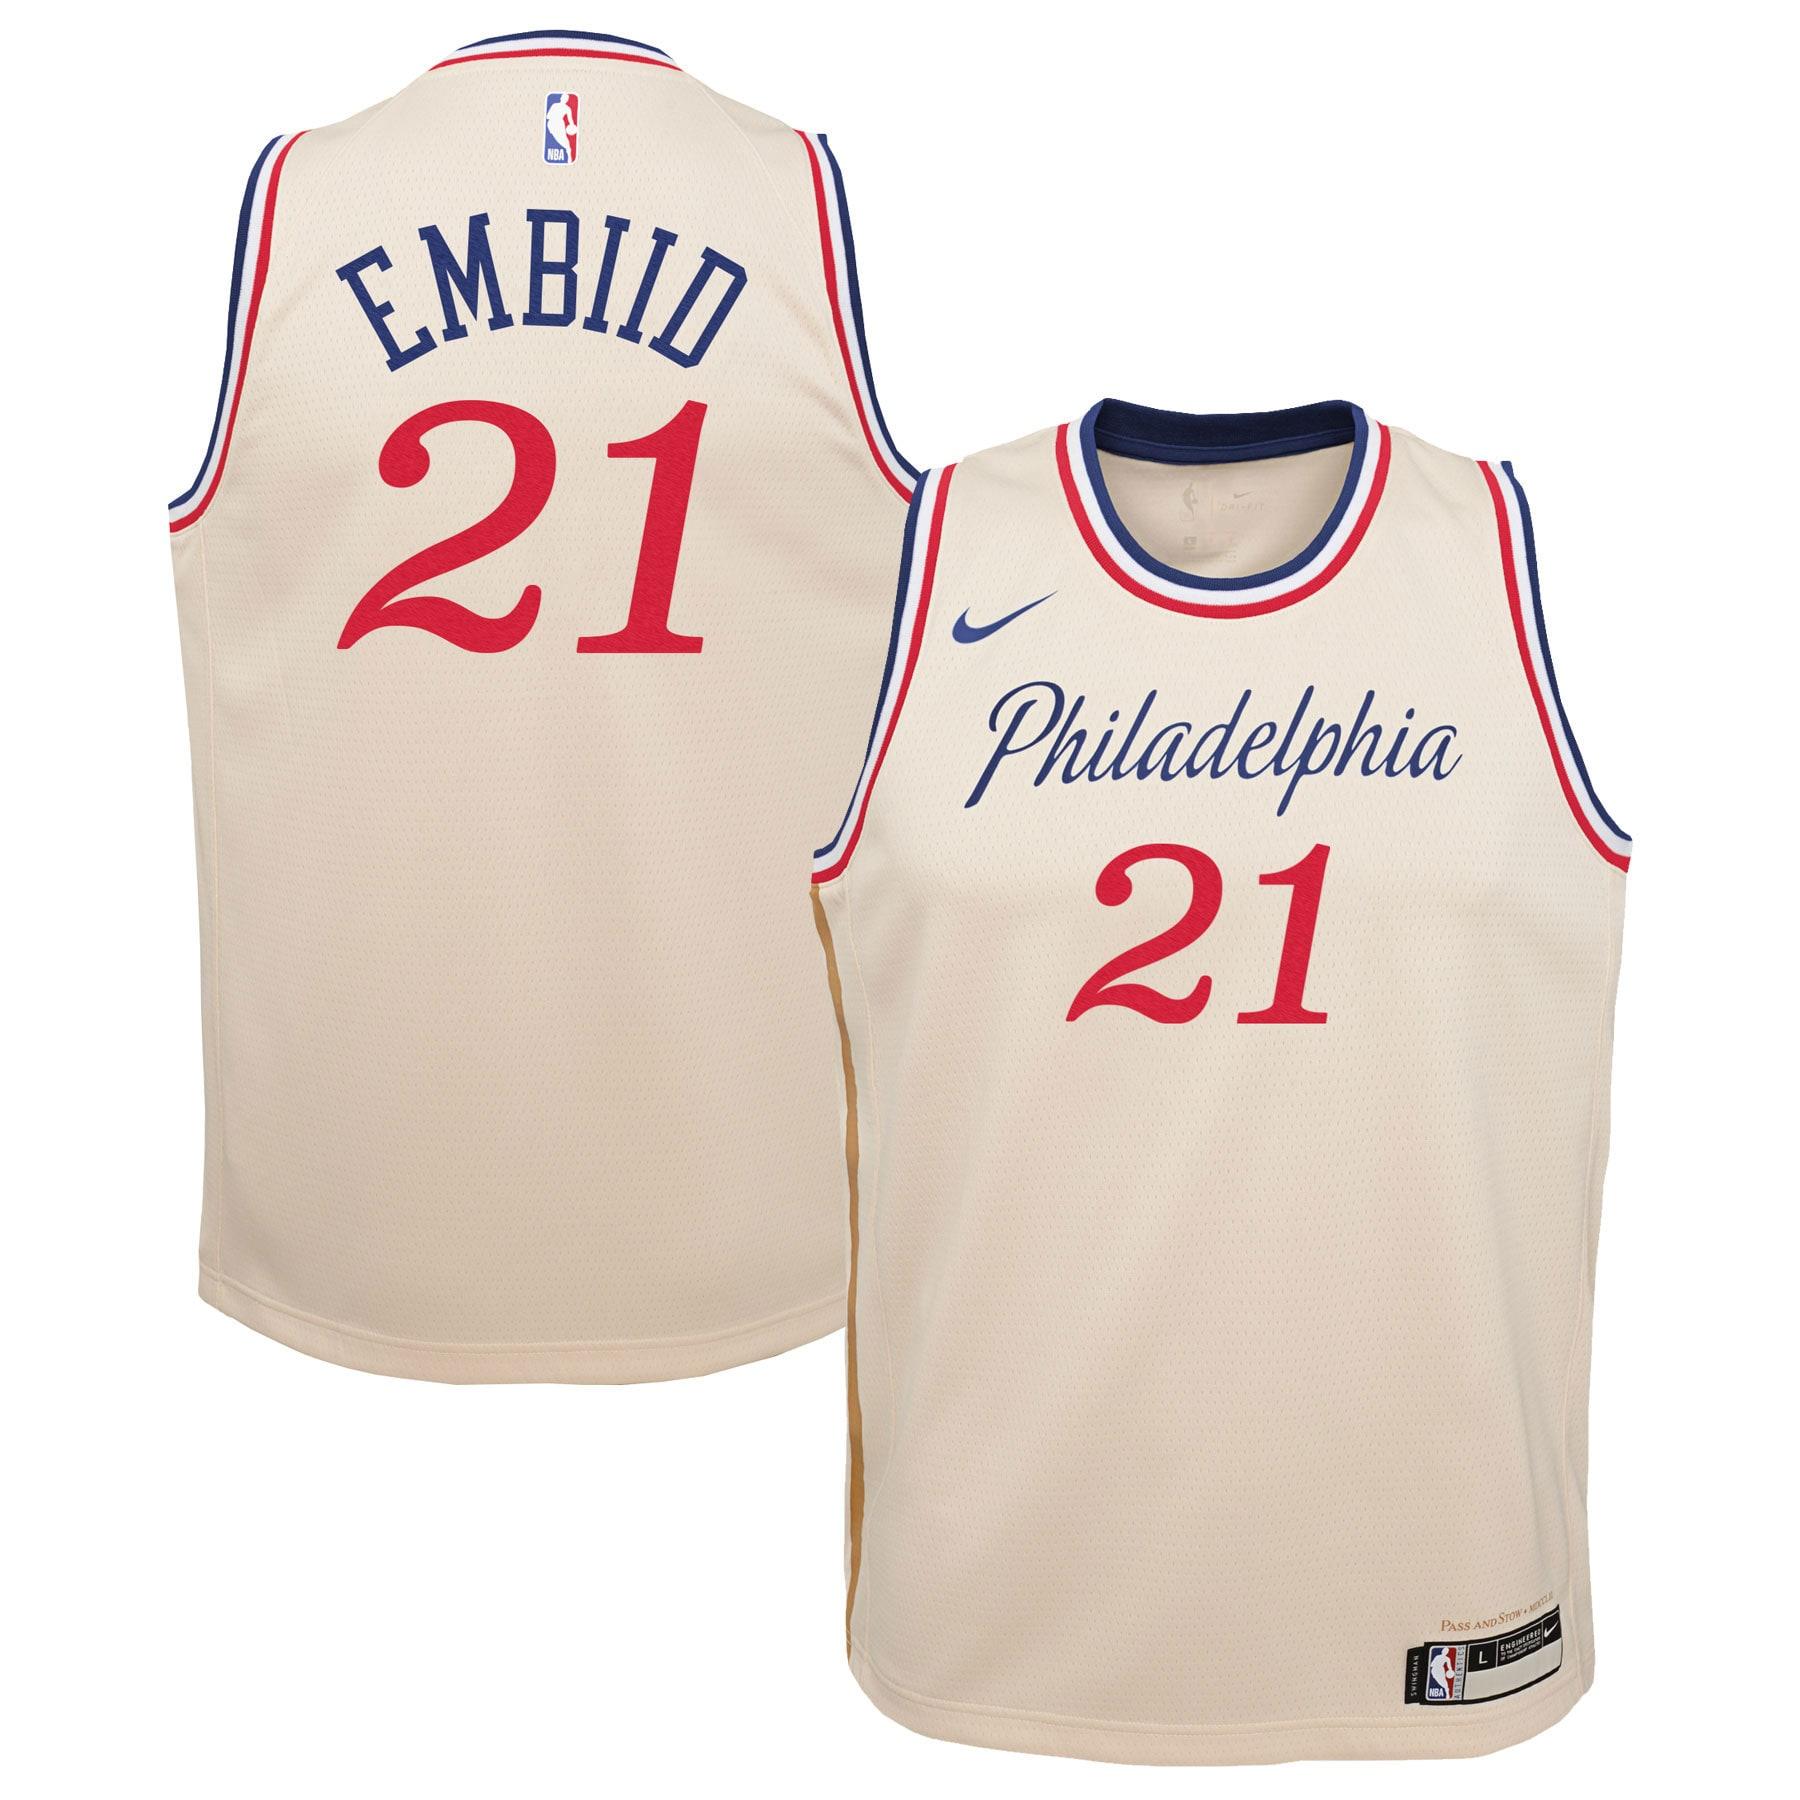 Joel Embiid Philadelphia 76ers Nike Youth Swingman Jersey Cream - City Edition